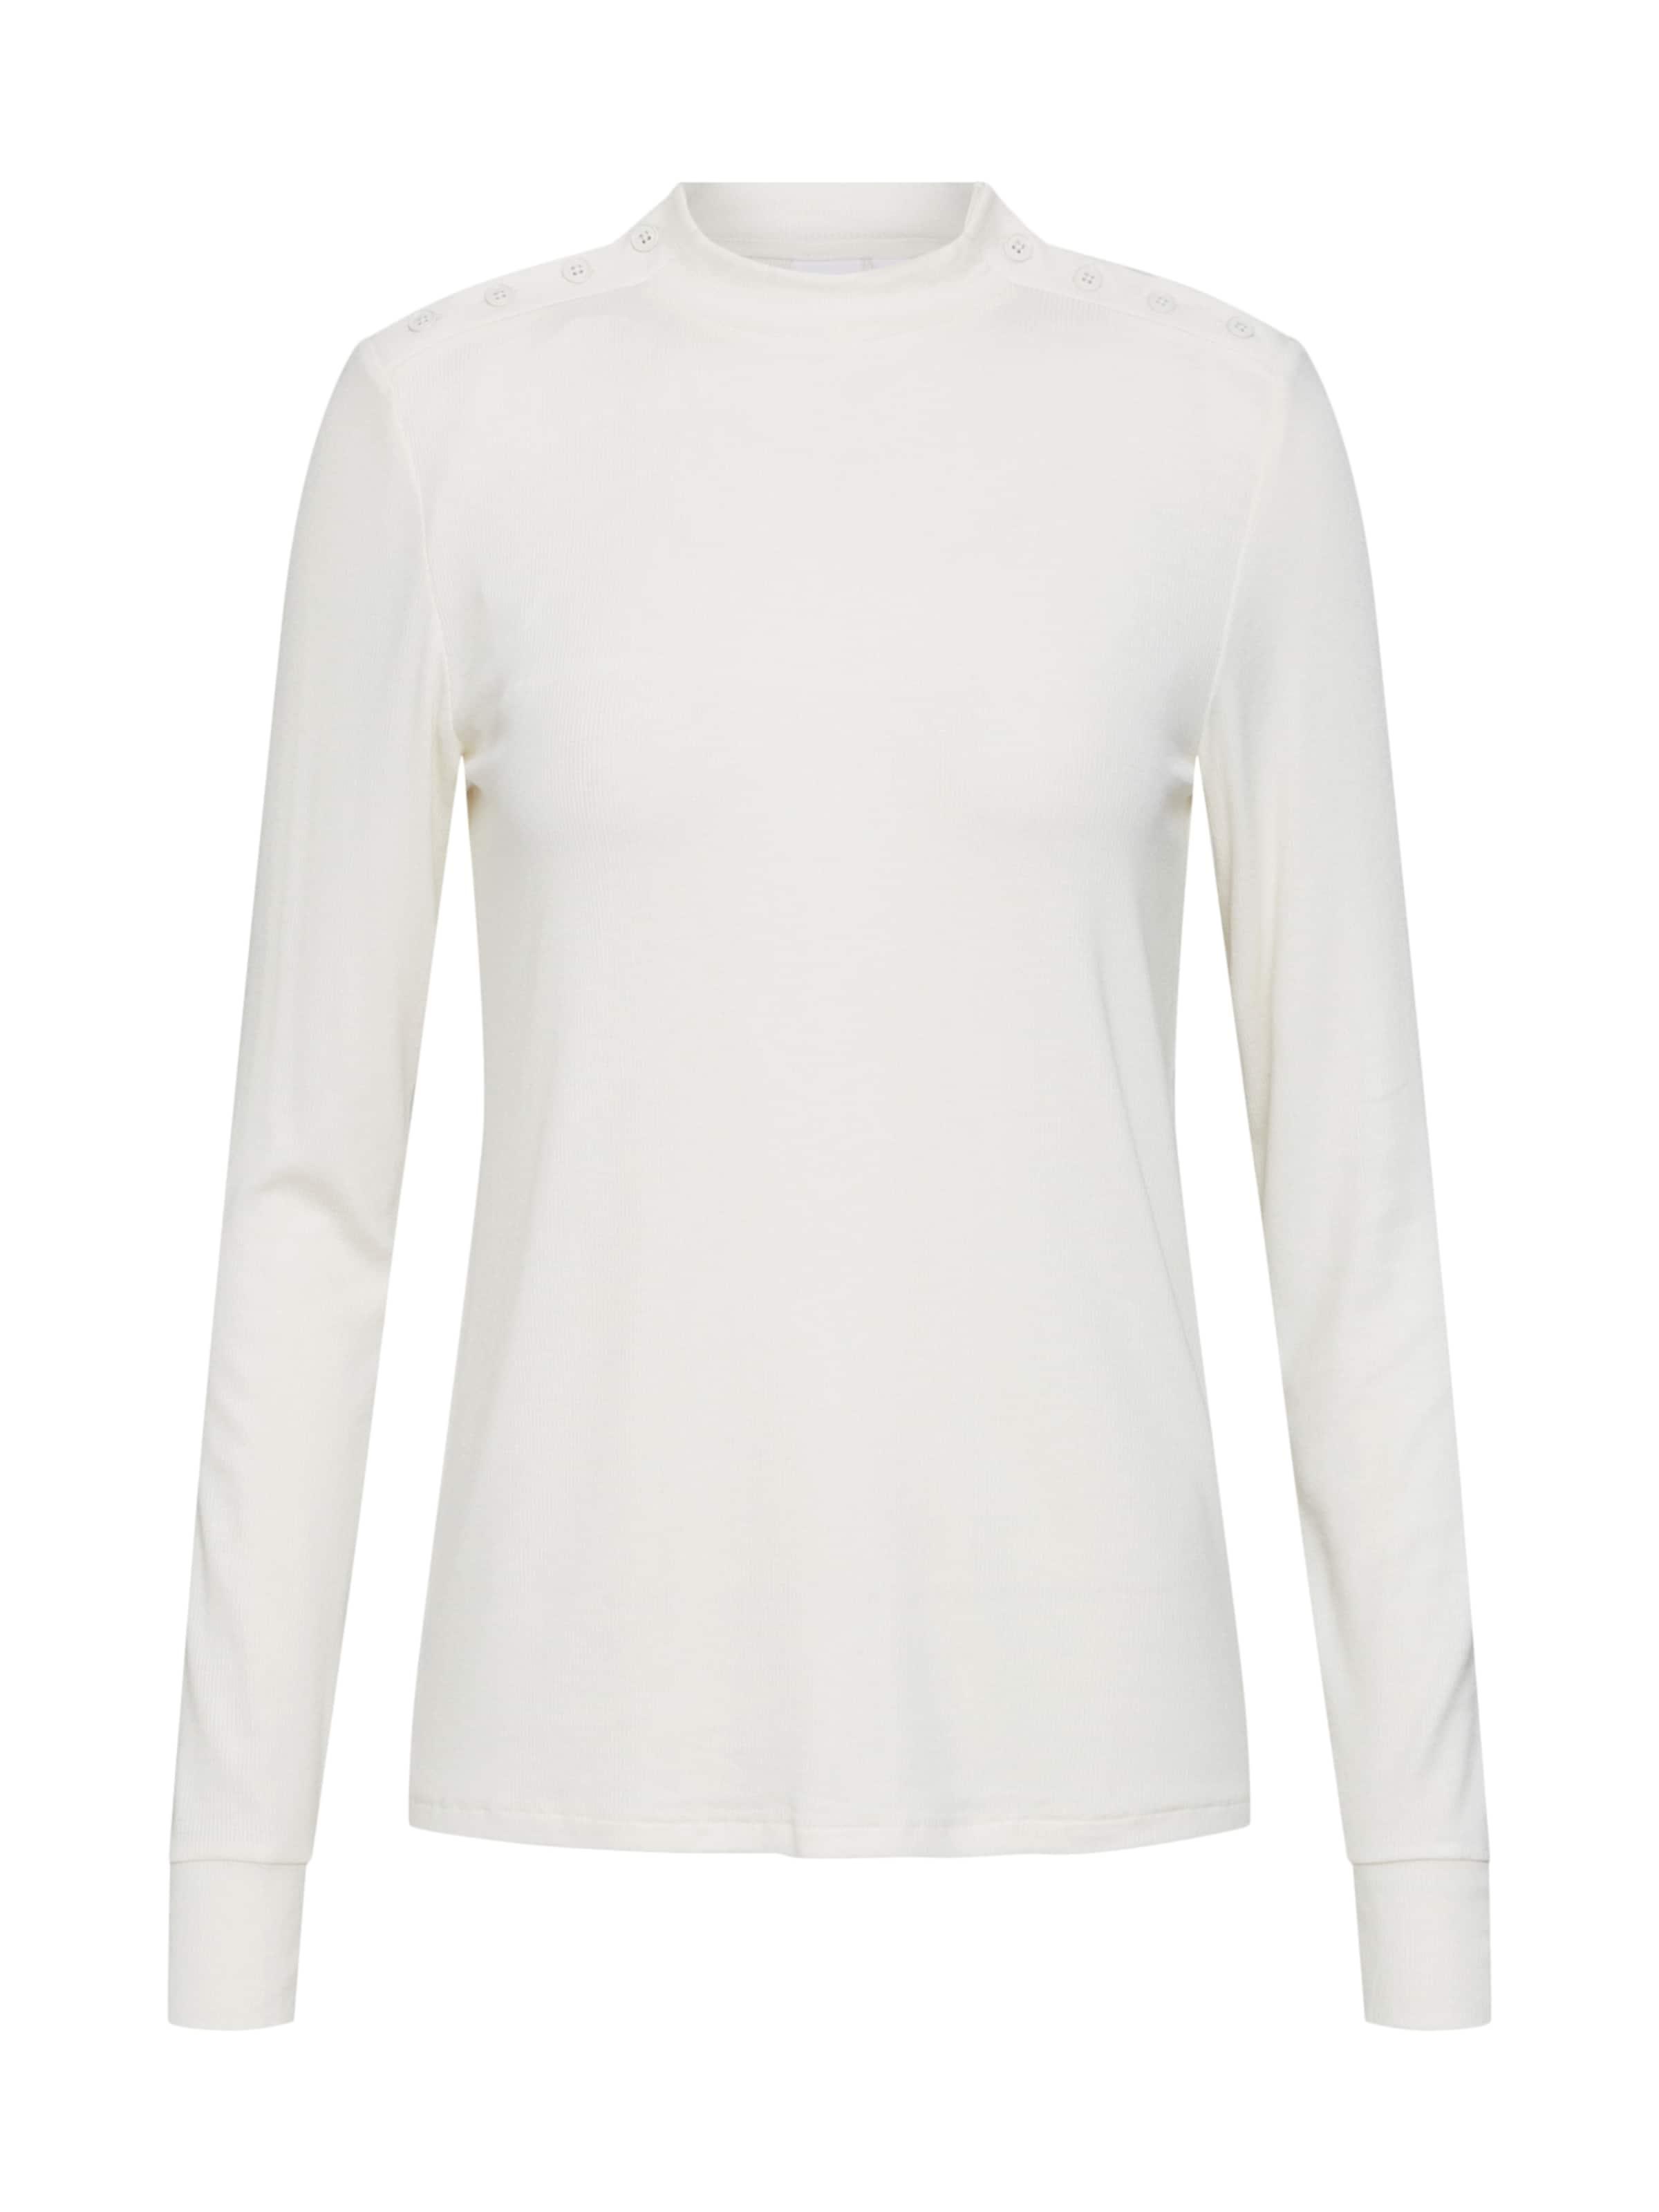 Blanc T shirt En Gap Naturel htsQCrdx